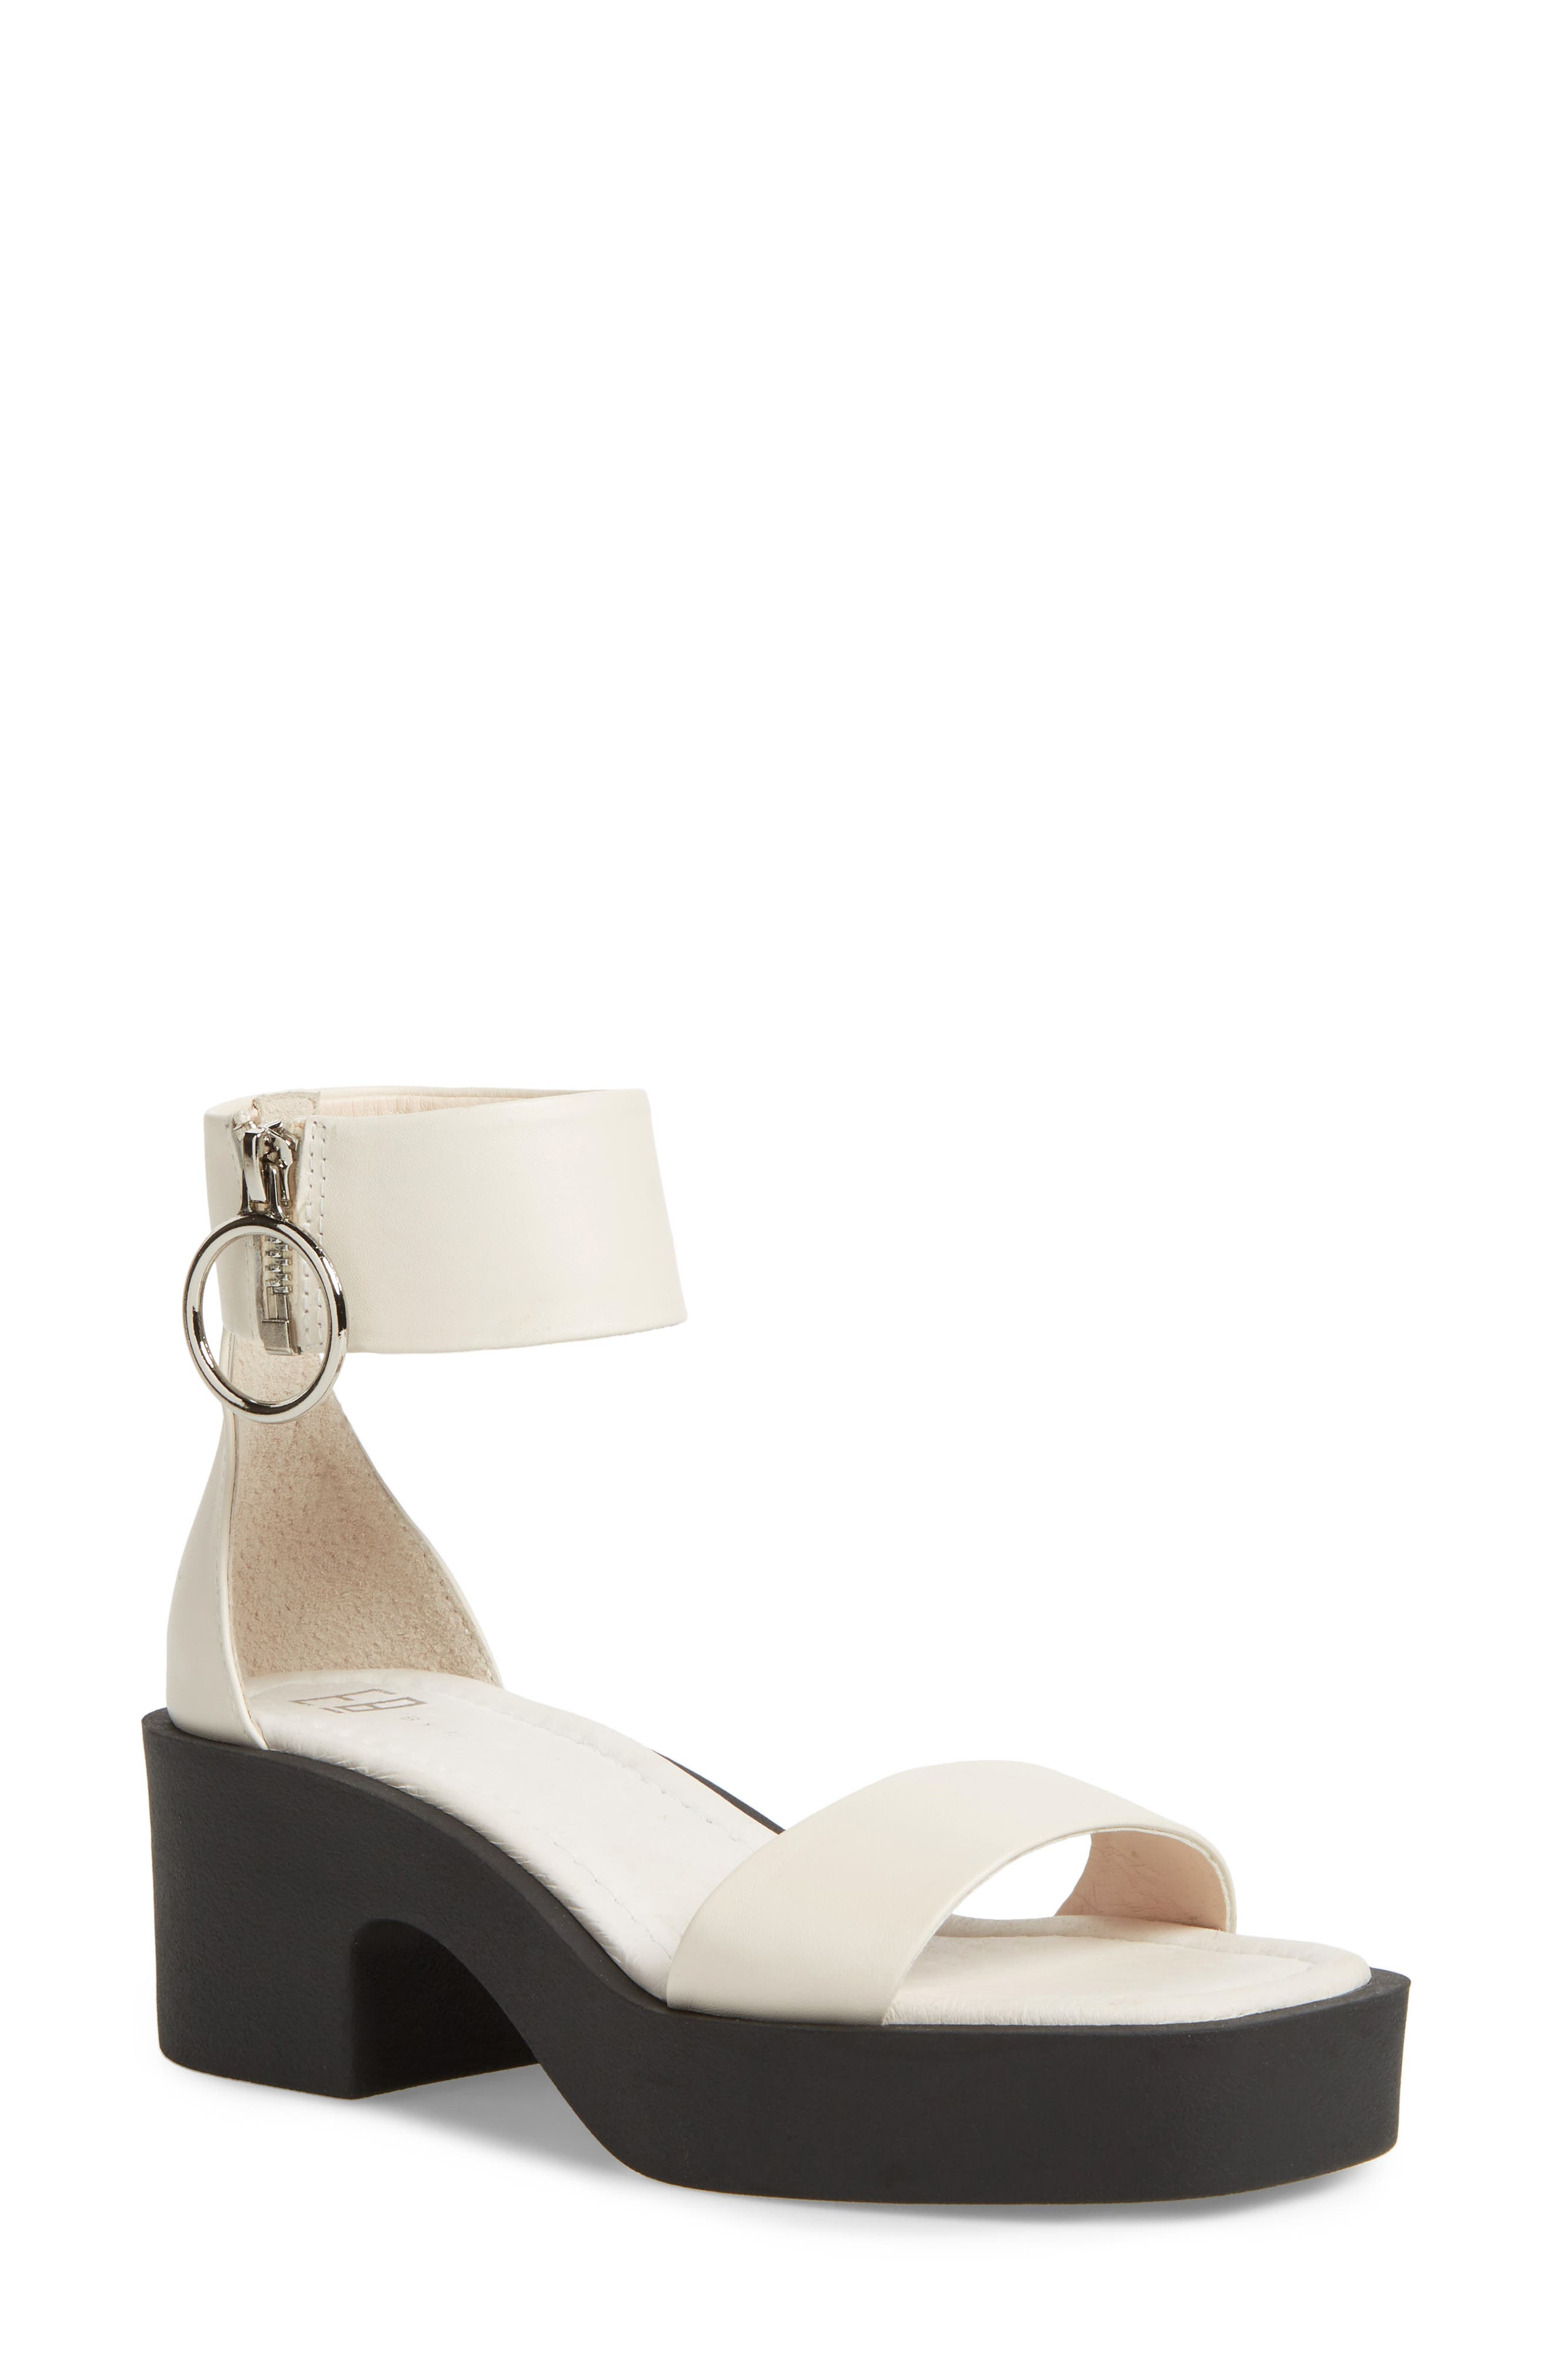 Savannah Cuff Platform Sandal,                         Main,                         color, Cream Leather